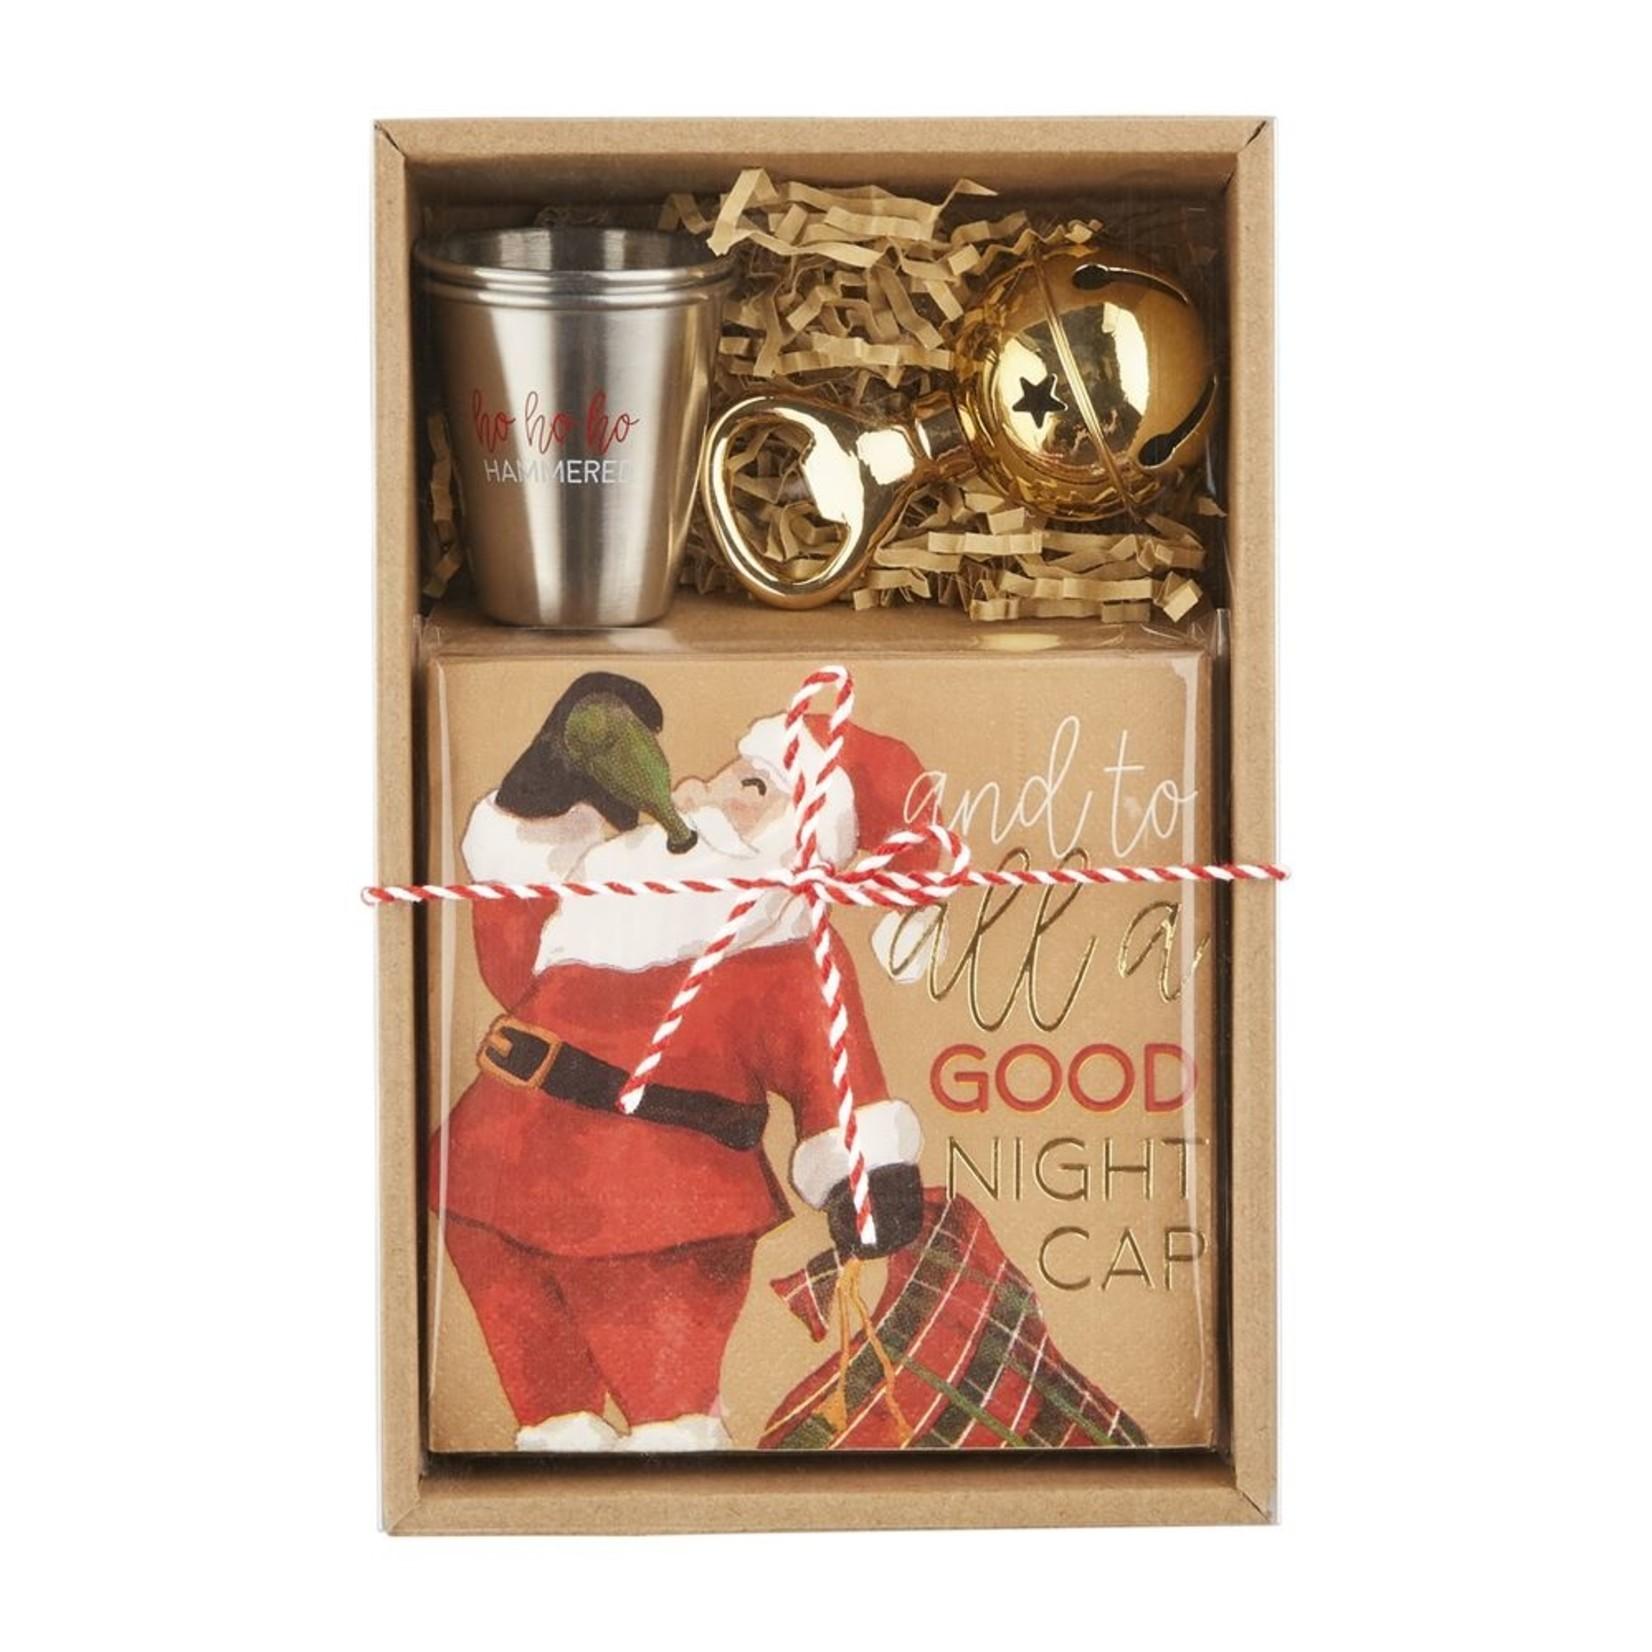 Mudpie Holiday Bar Gift Set